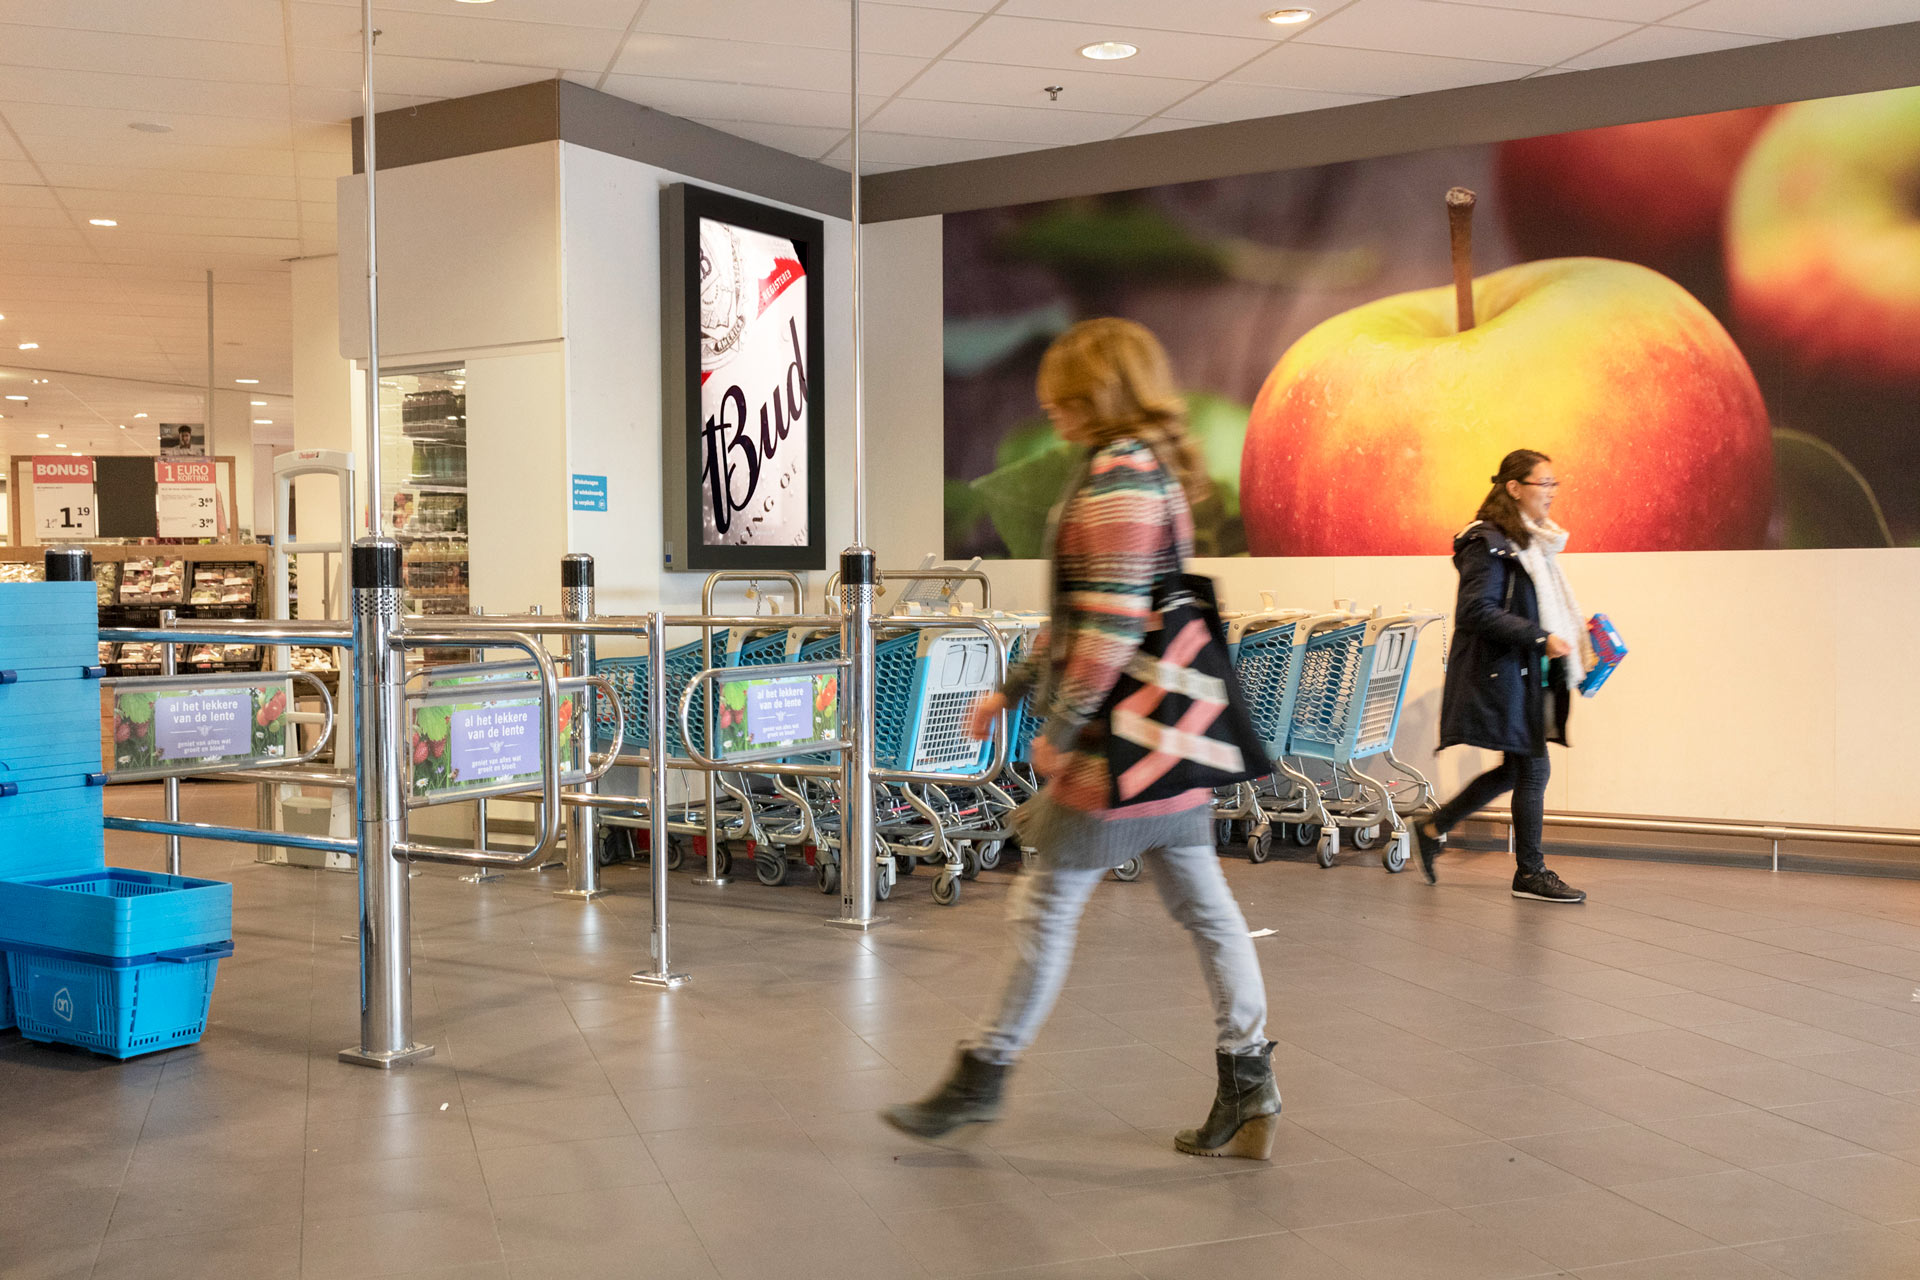 waterlandplein amsterdam supermarkt screen digitale buitenreclame